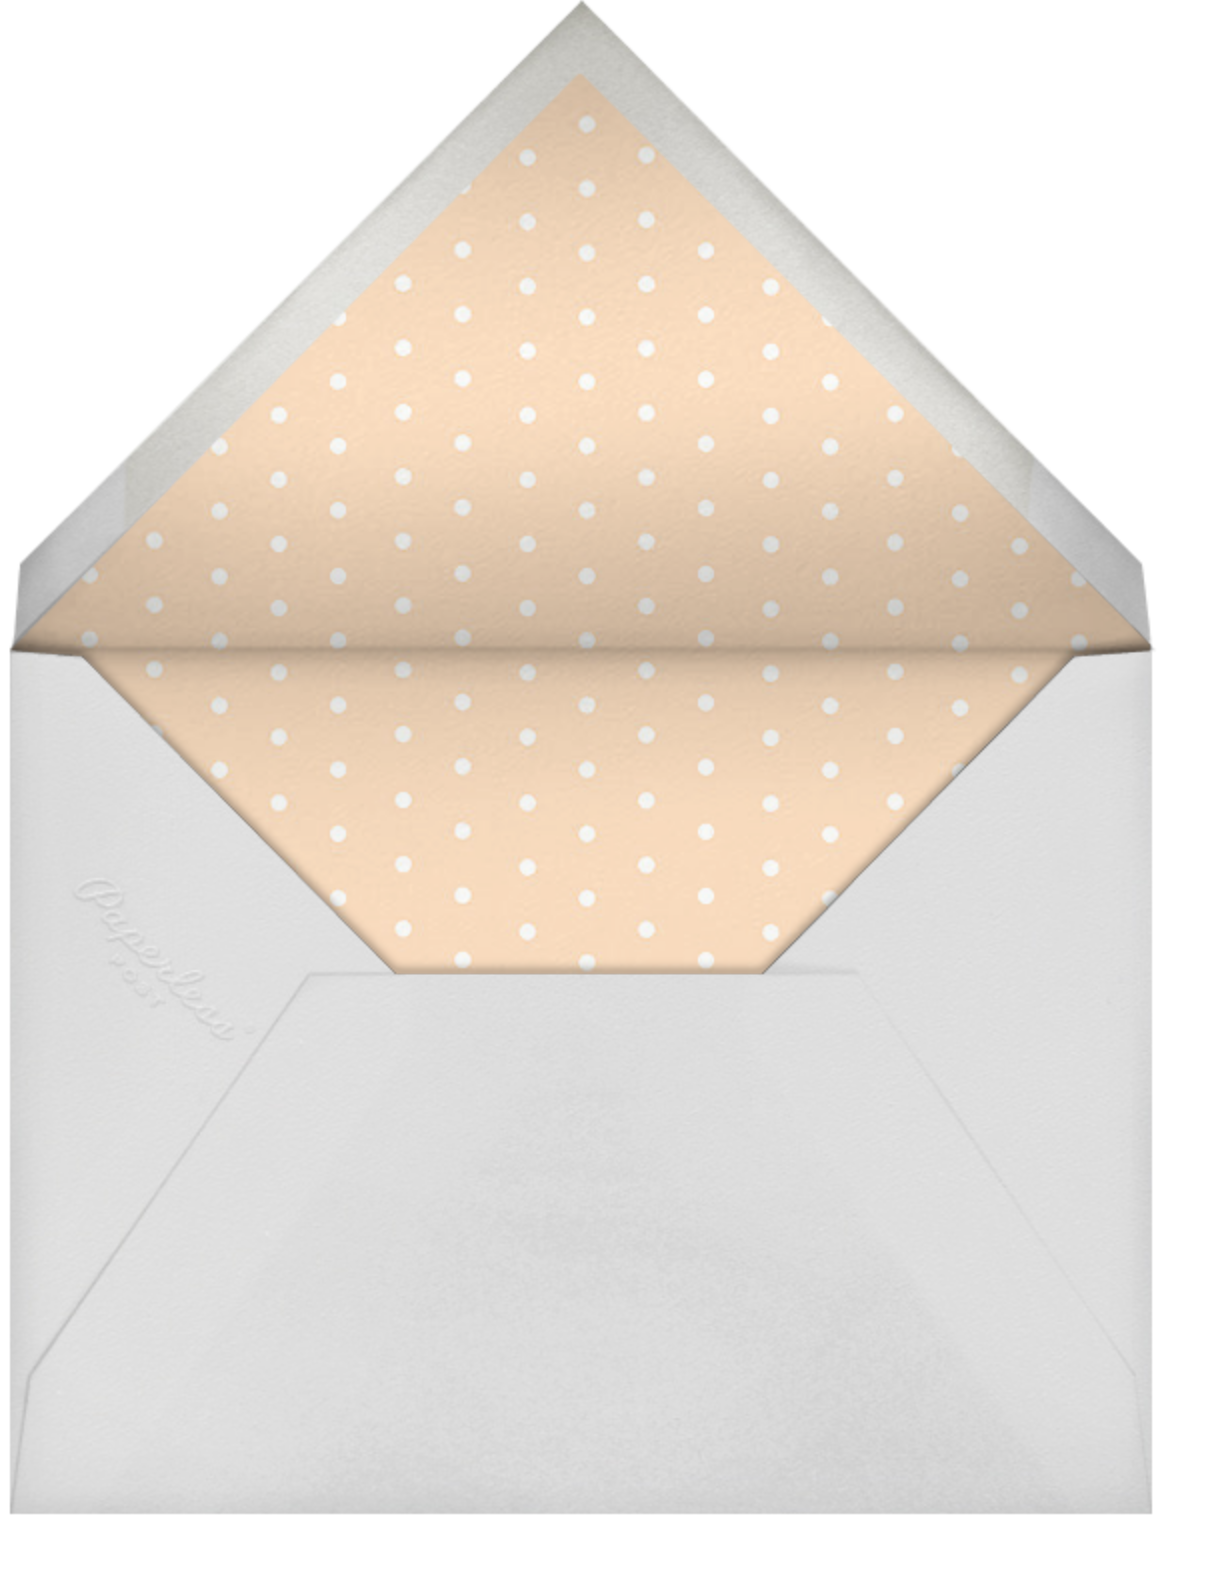 Baby Building Blocks - Rifle Paper Co. - Baby shower - envelope back